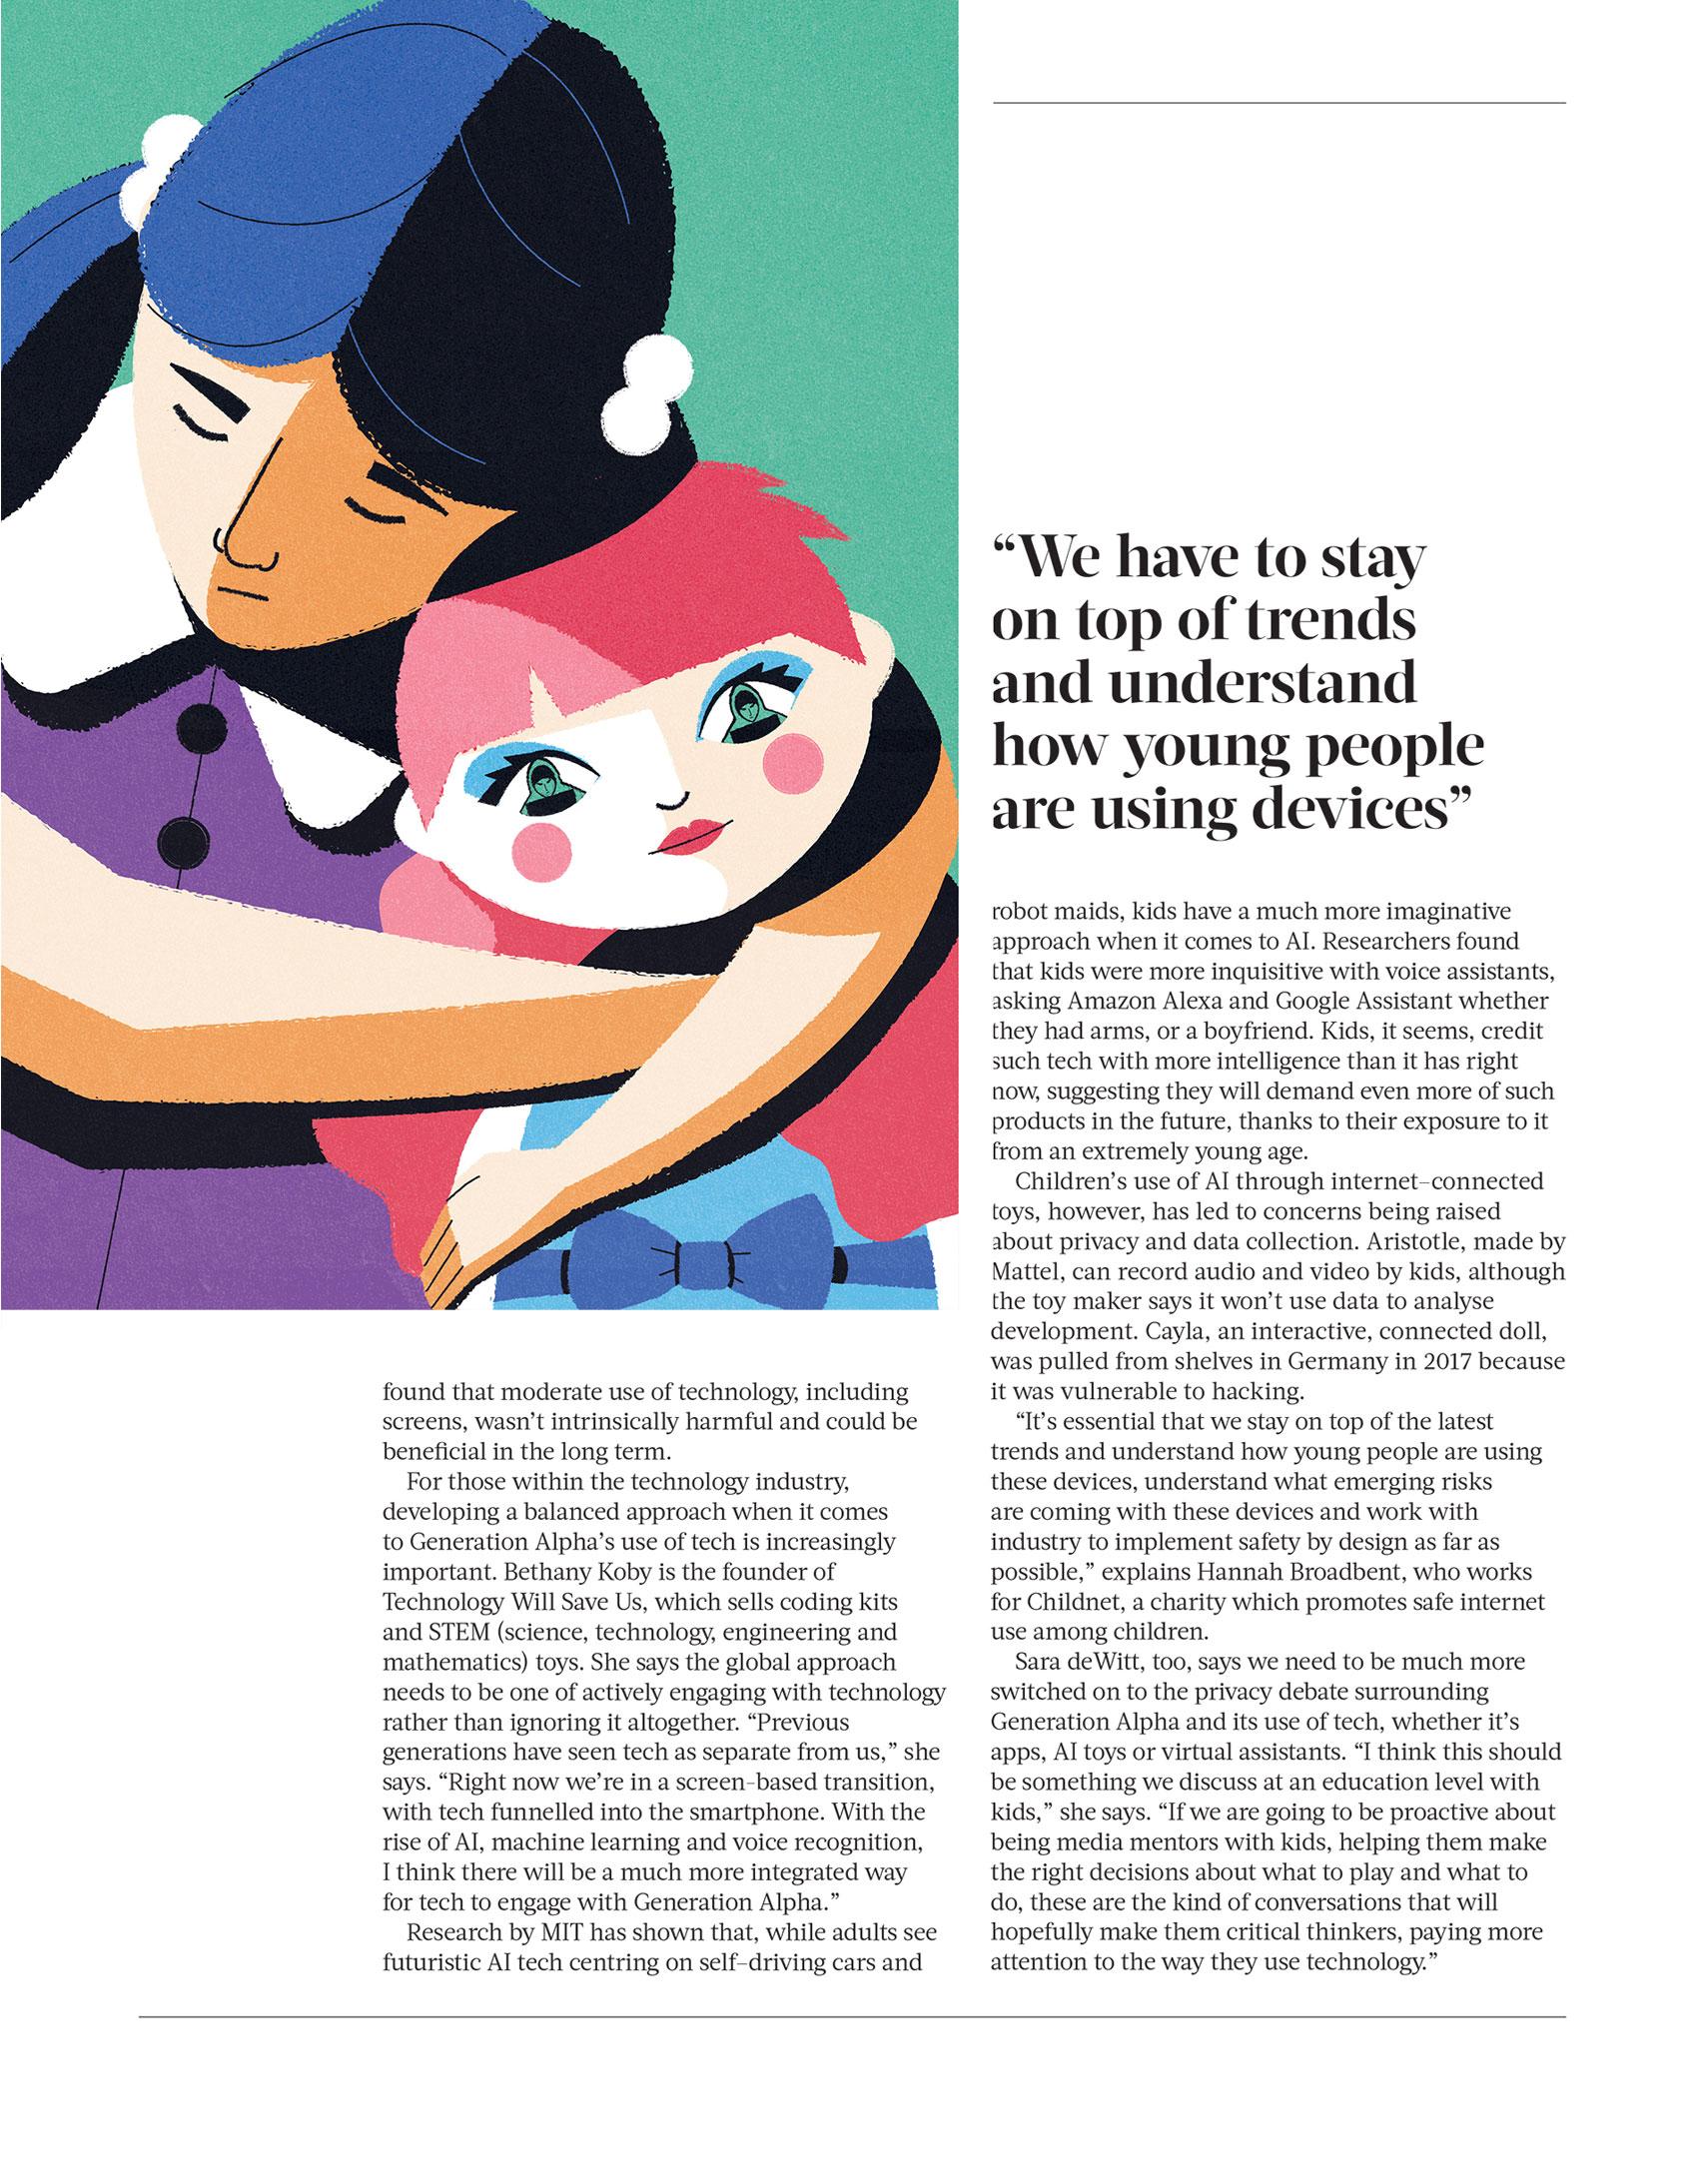 freelance illustrator dale edwin murray editorial conceptual illustration oryx magazine